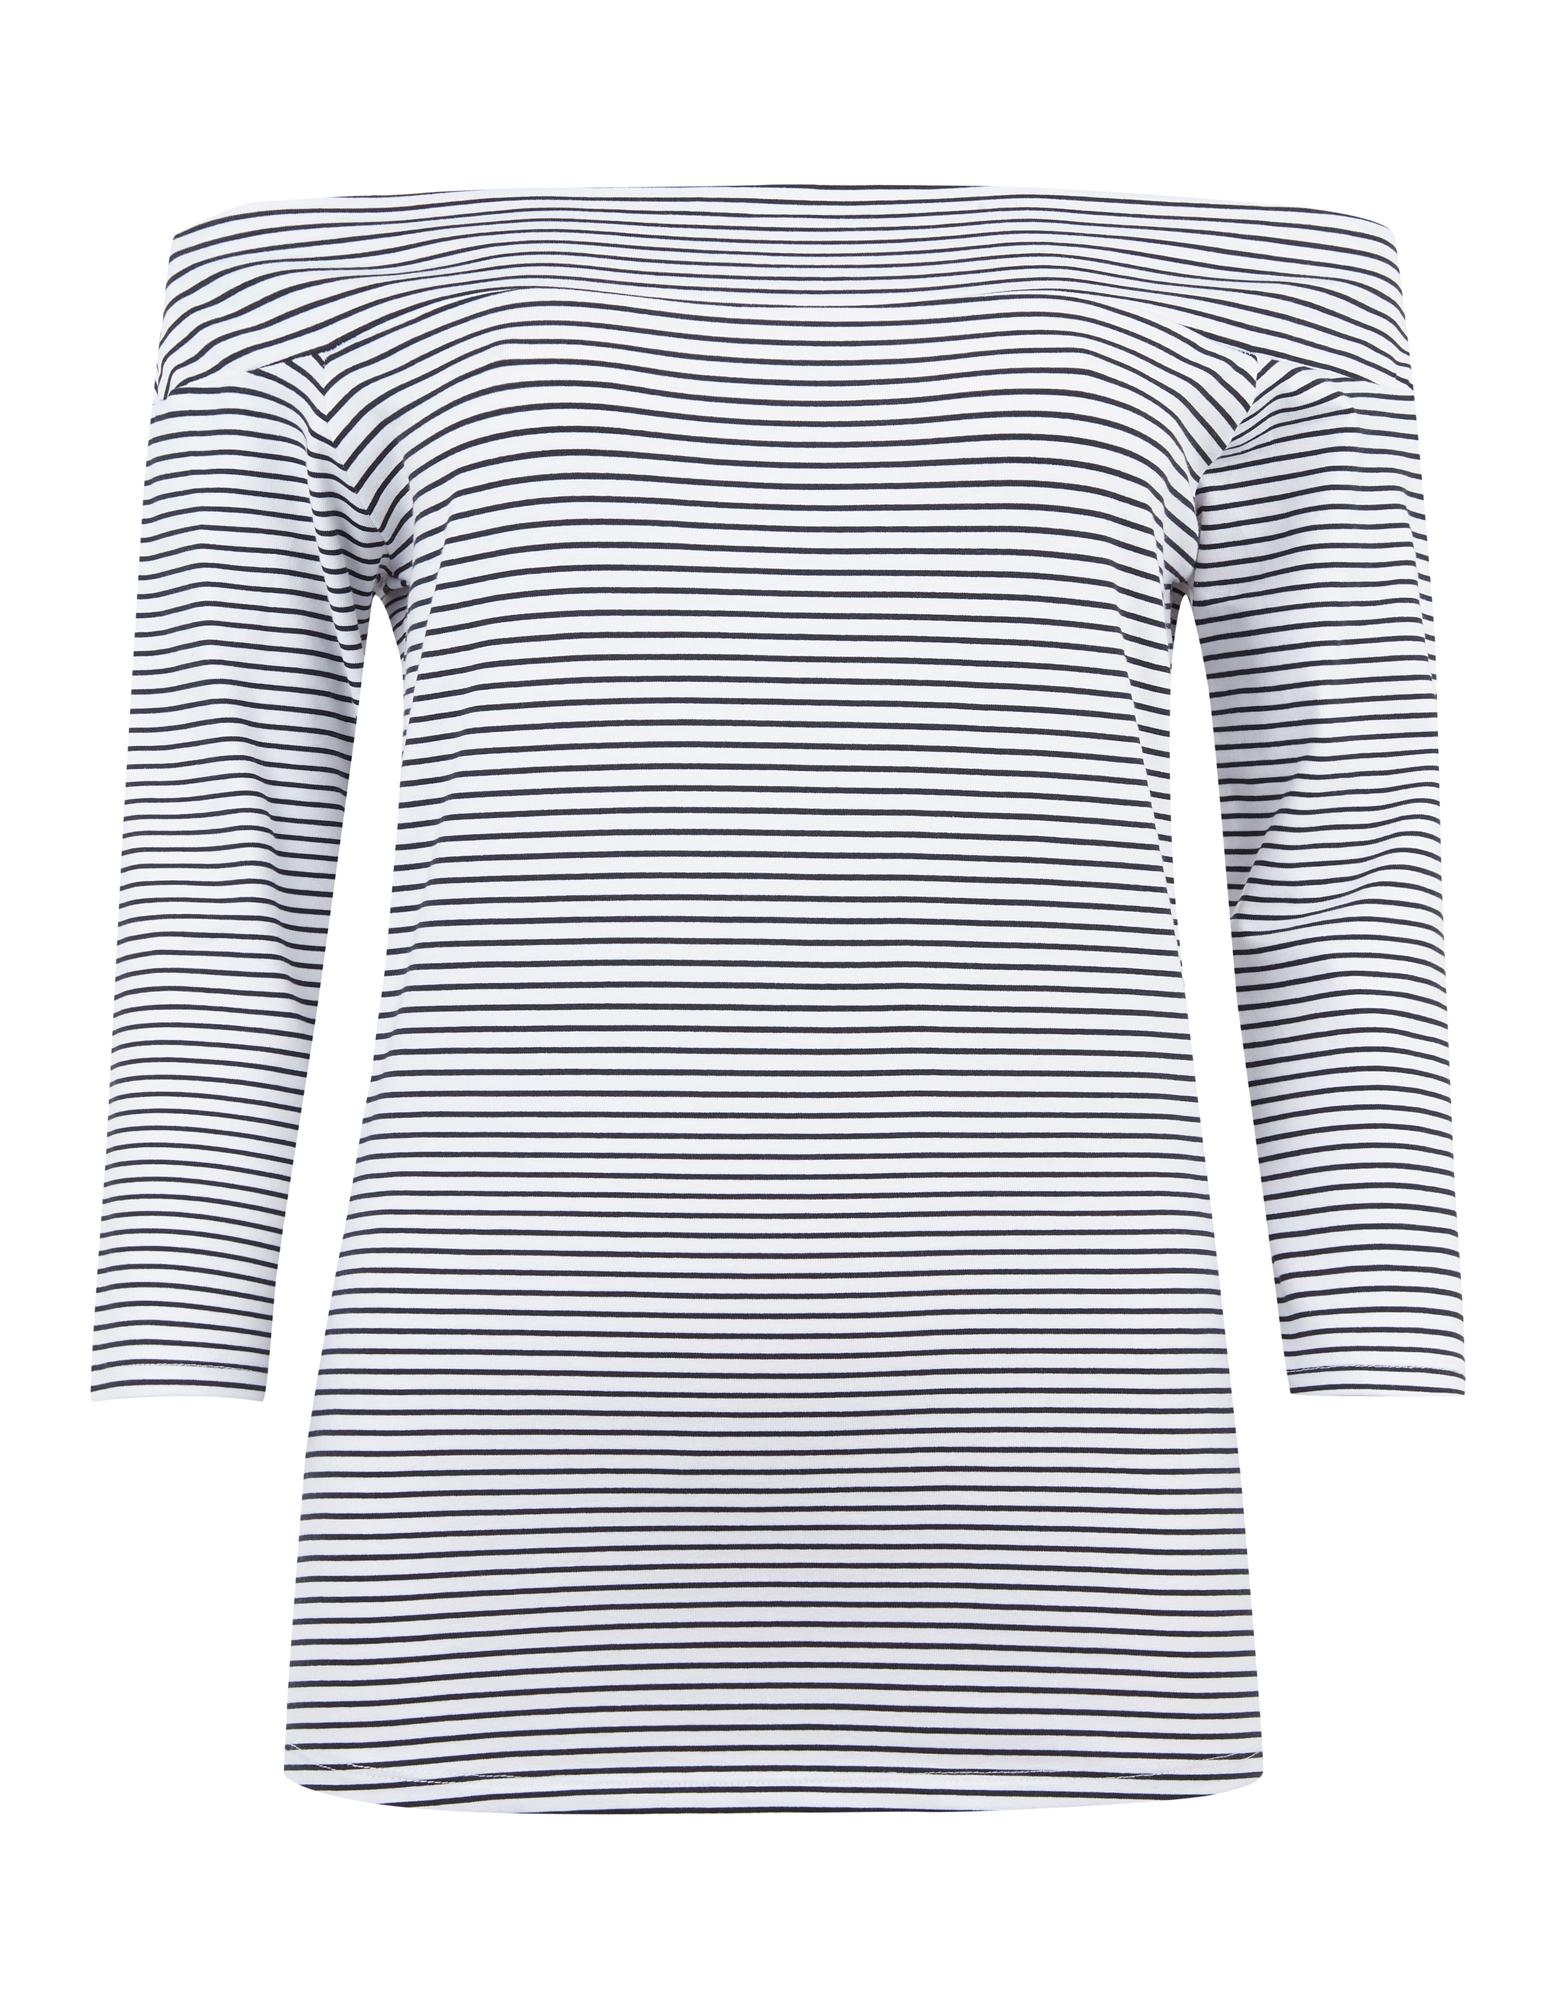 20b511c442778d Damen Shirt mit U-Boot-Ausschnitt - Takko Fashion